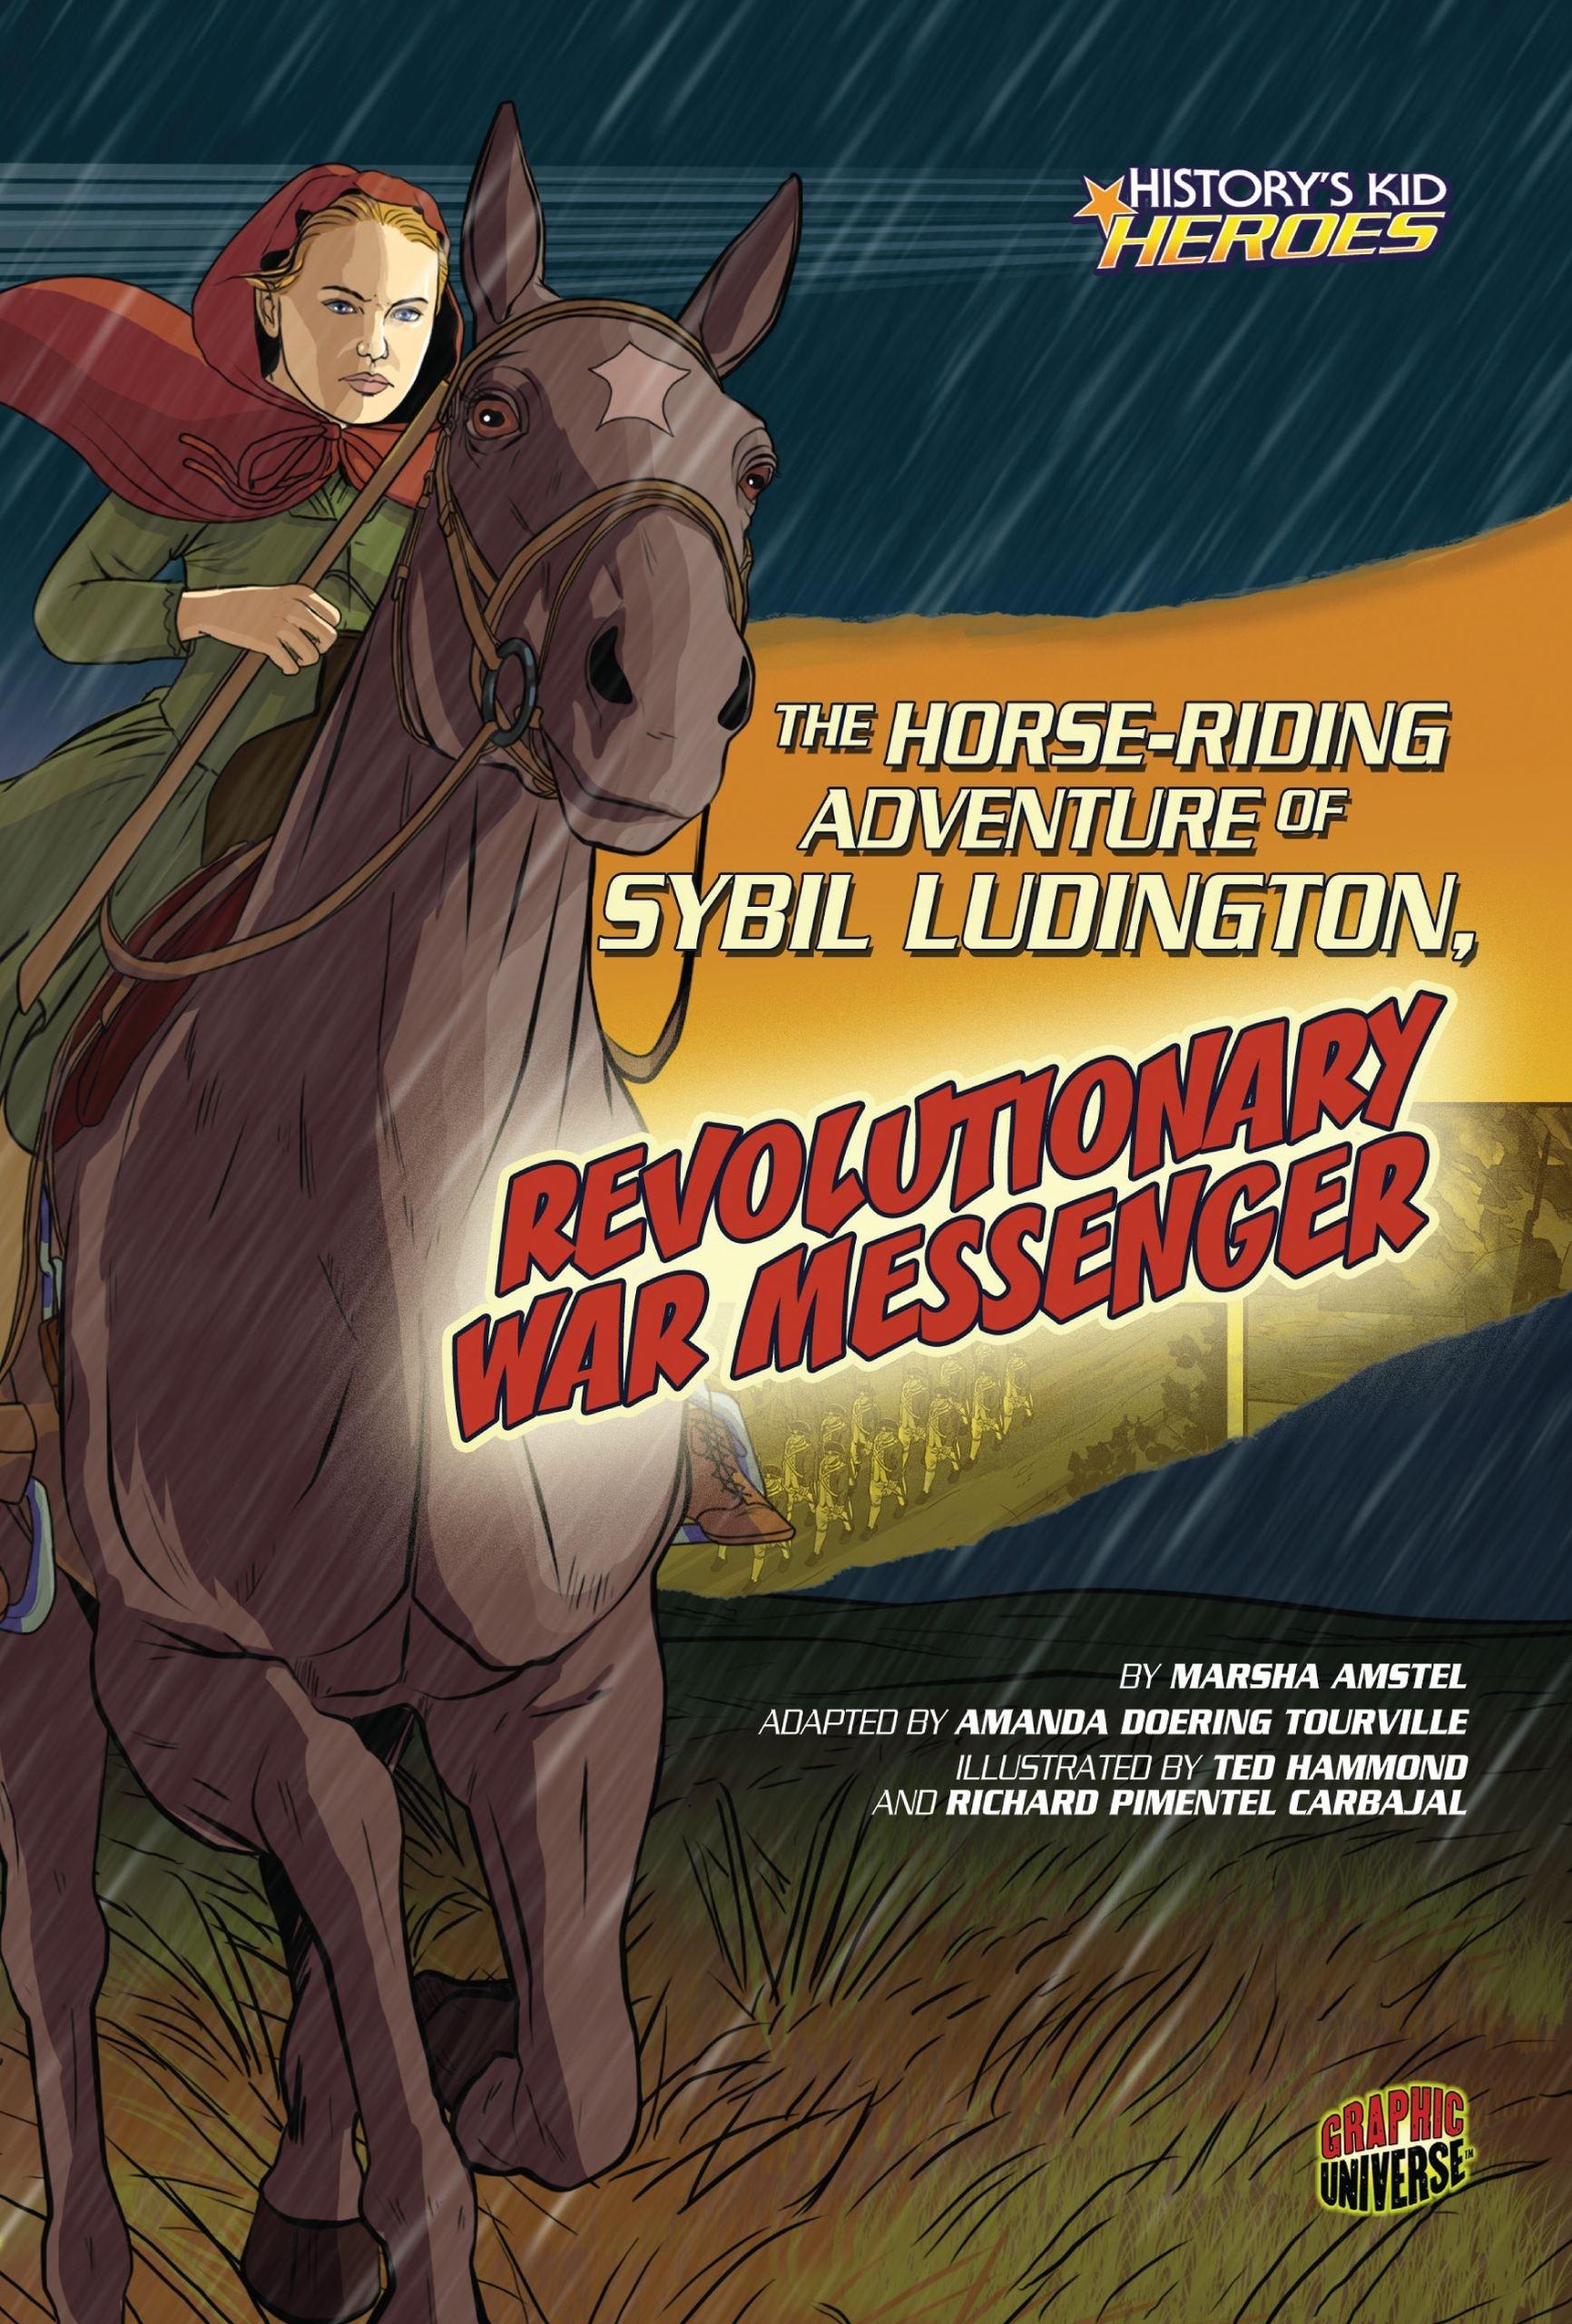 Download The Horse-riding Adventure of Sybil Ludington, Revolutionary War Messenger (History's Kid Heroes) pdf